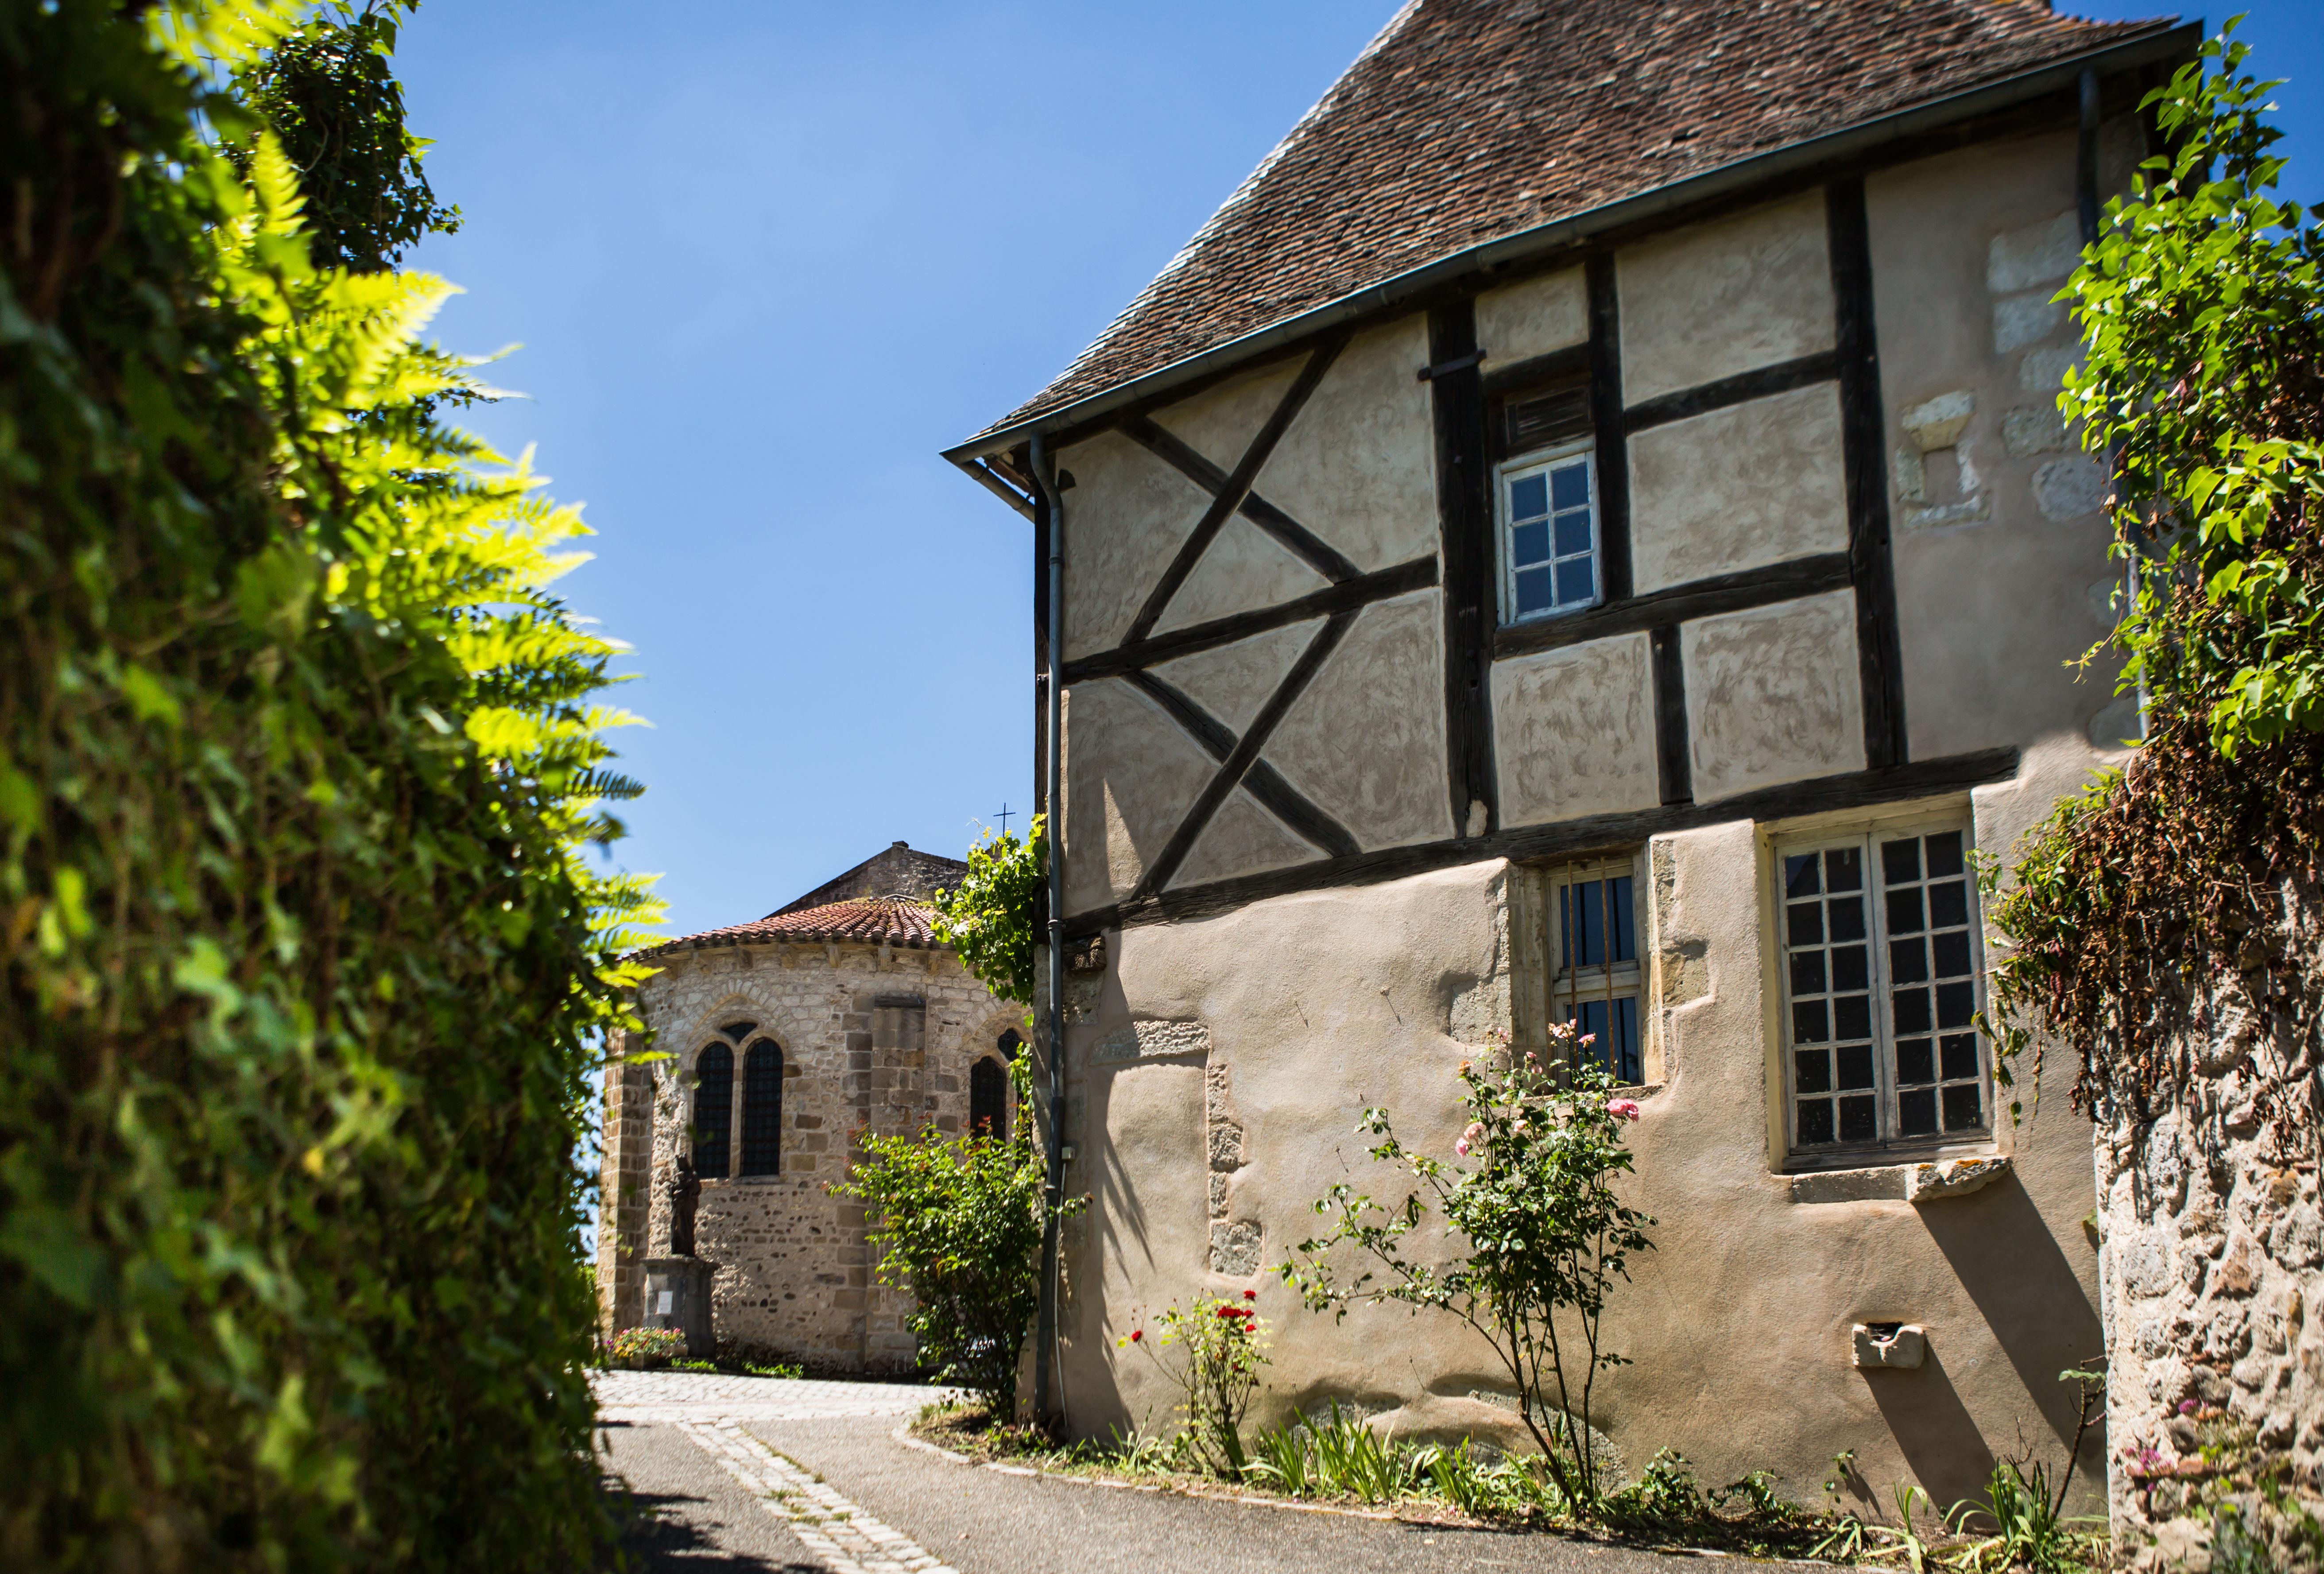 Village de Verneuil-en-Bourbonnais Ⓒ Olivier Octobre / GTMC-VTT